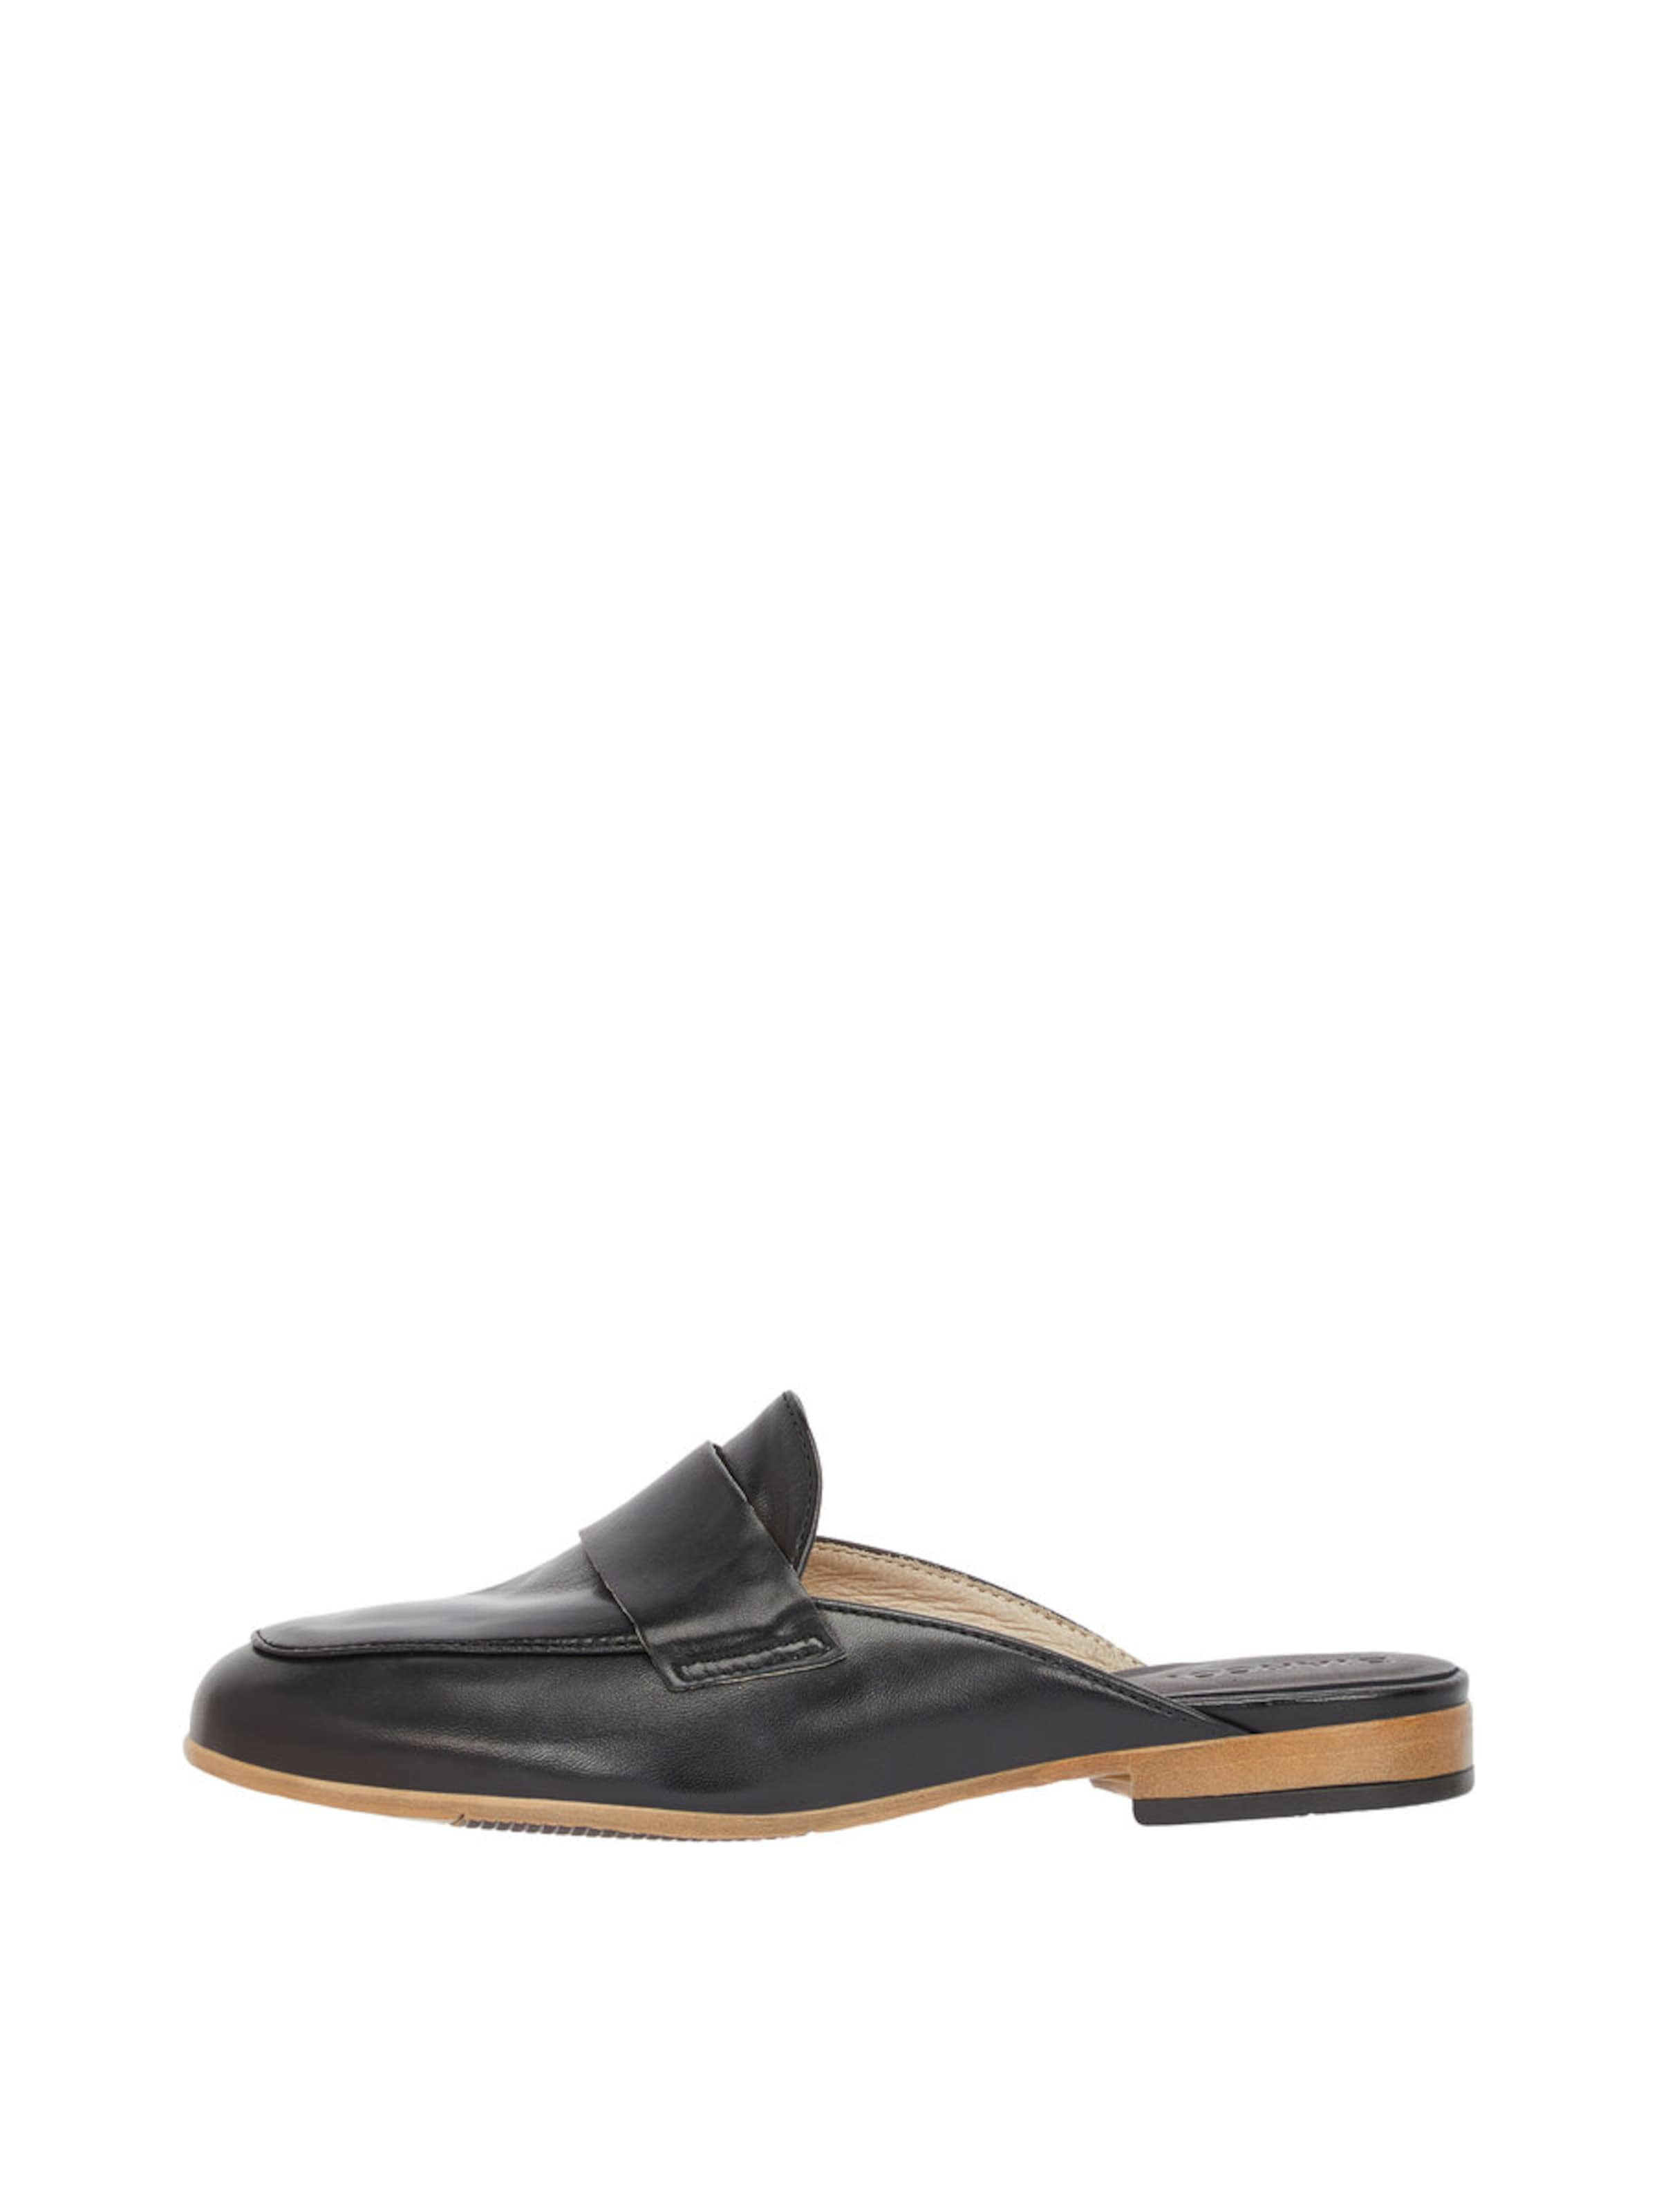 Haltbare Mode billige Schuhe Bianco | Halbschuhe Schuhe Gut getragene Schuhe